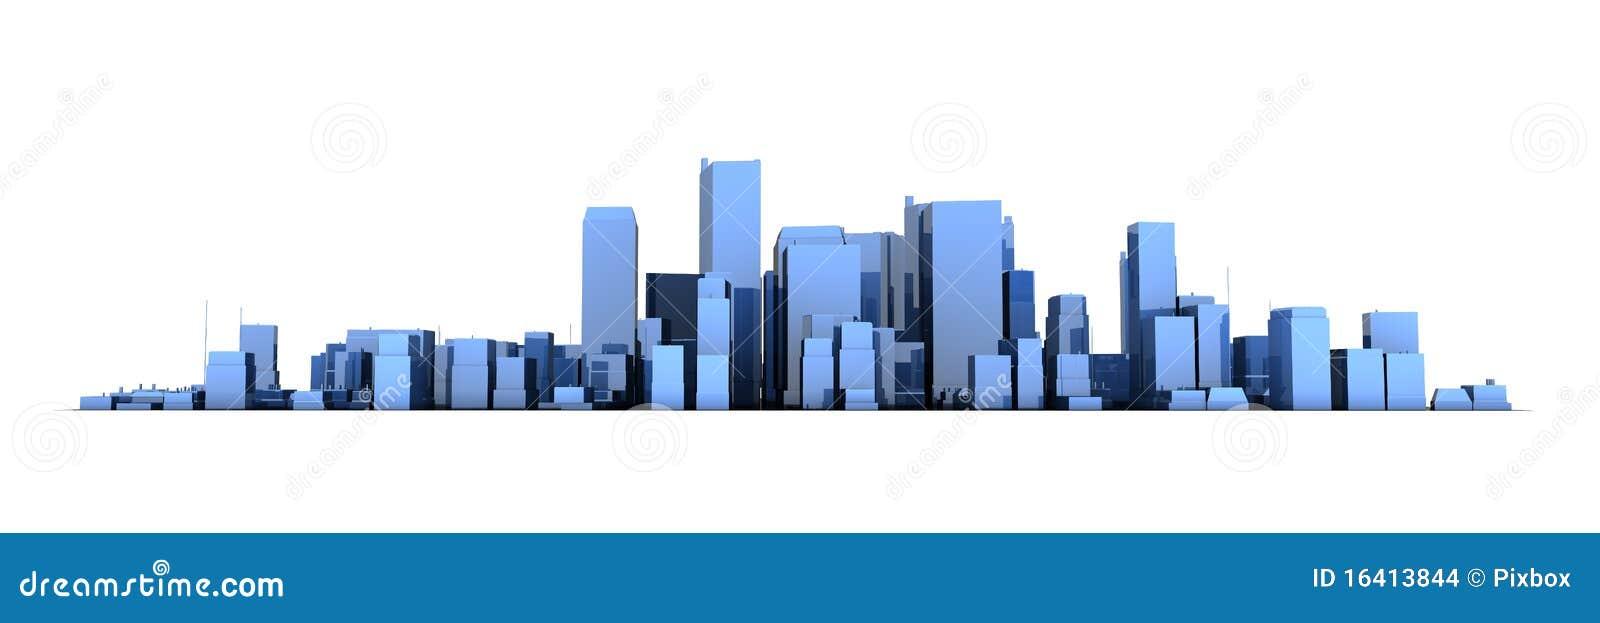 wide cityscape model 3d shiny blue city 16413844